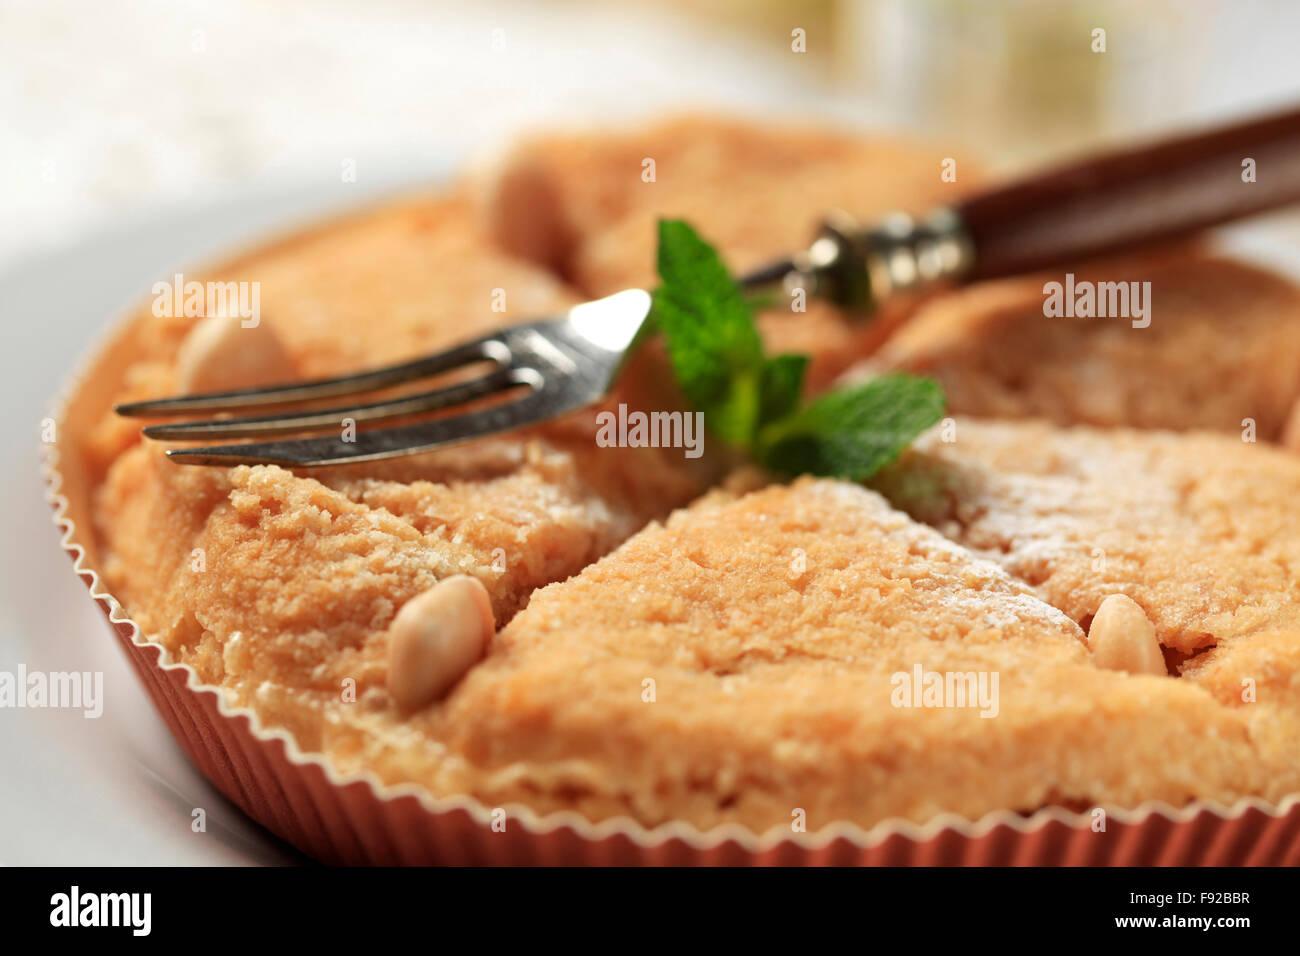 Fresh baked Dessert pie - detail Stock Photo